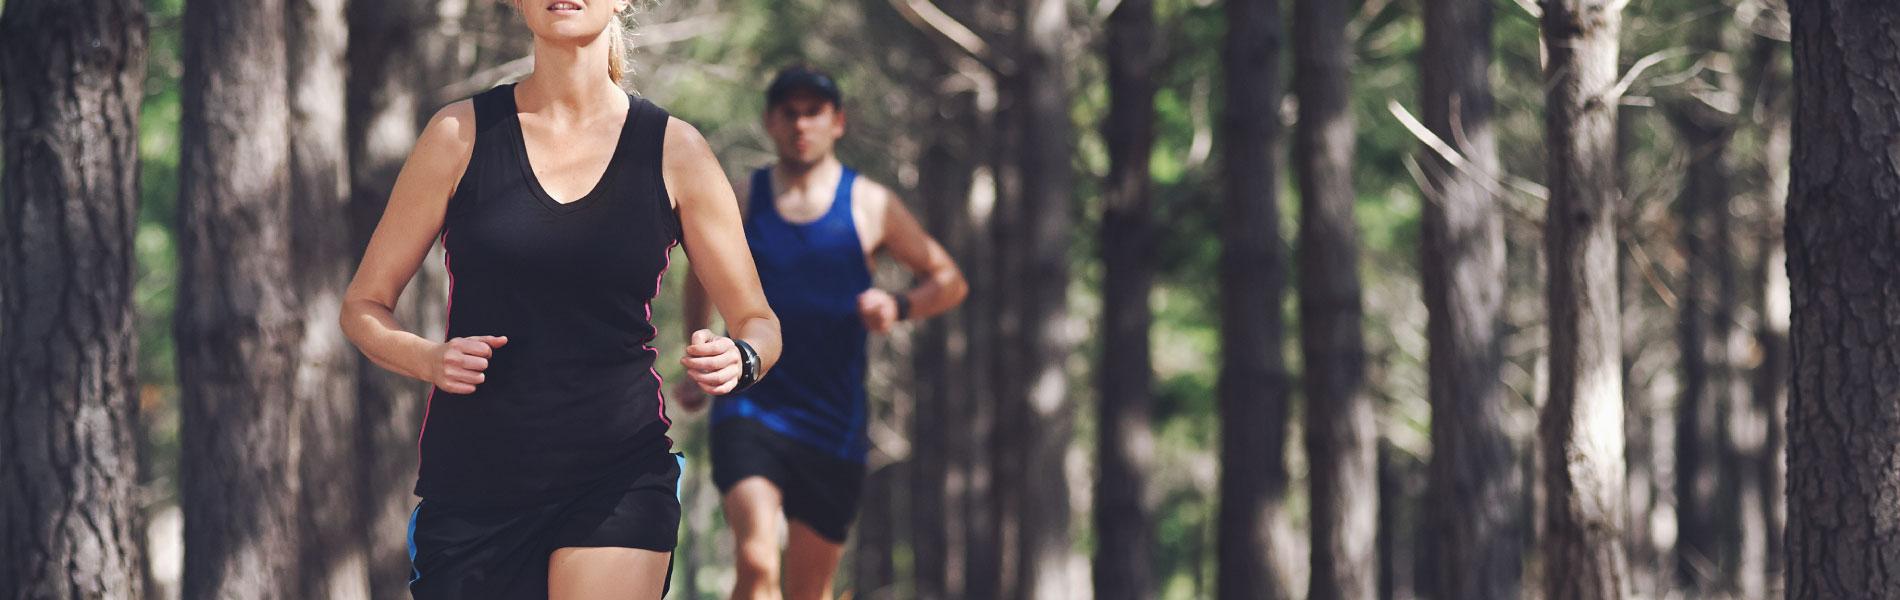 5_Fitness_Advocates_Making_Us_Healthier.jpg